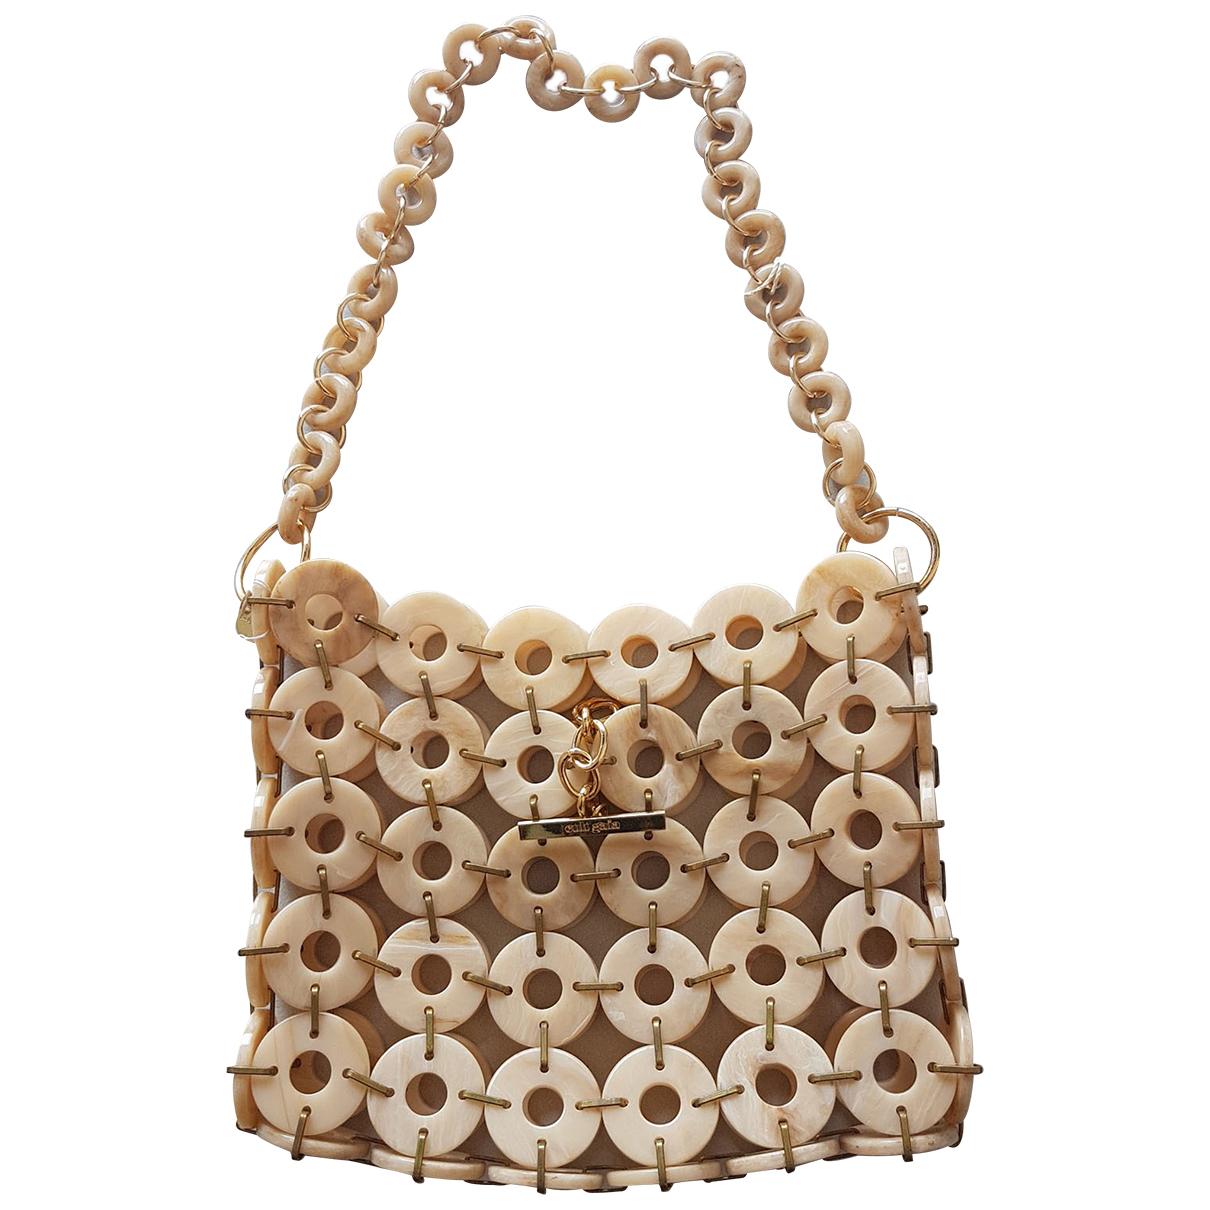 Cult Gaia N Beige handbag for Women N